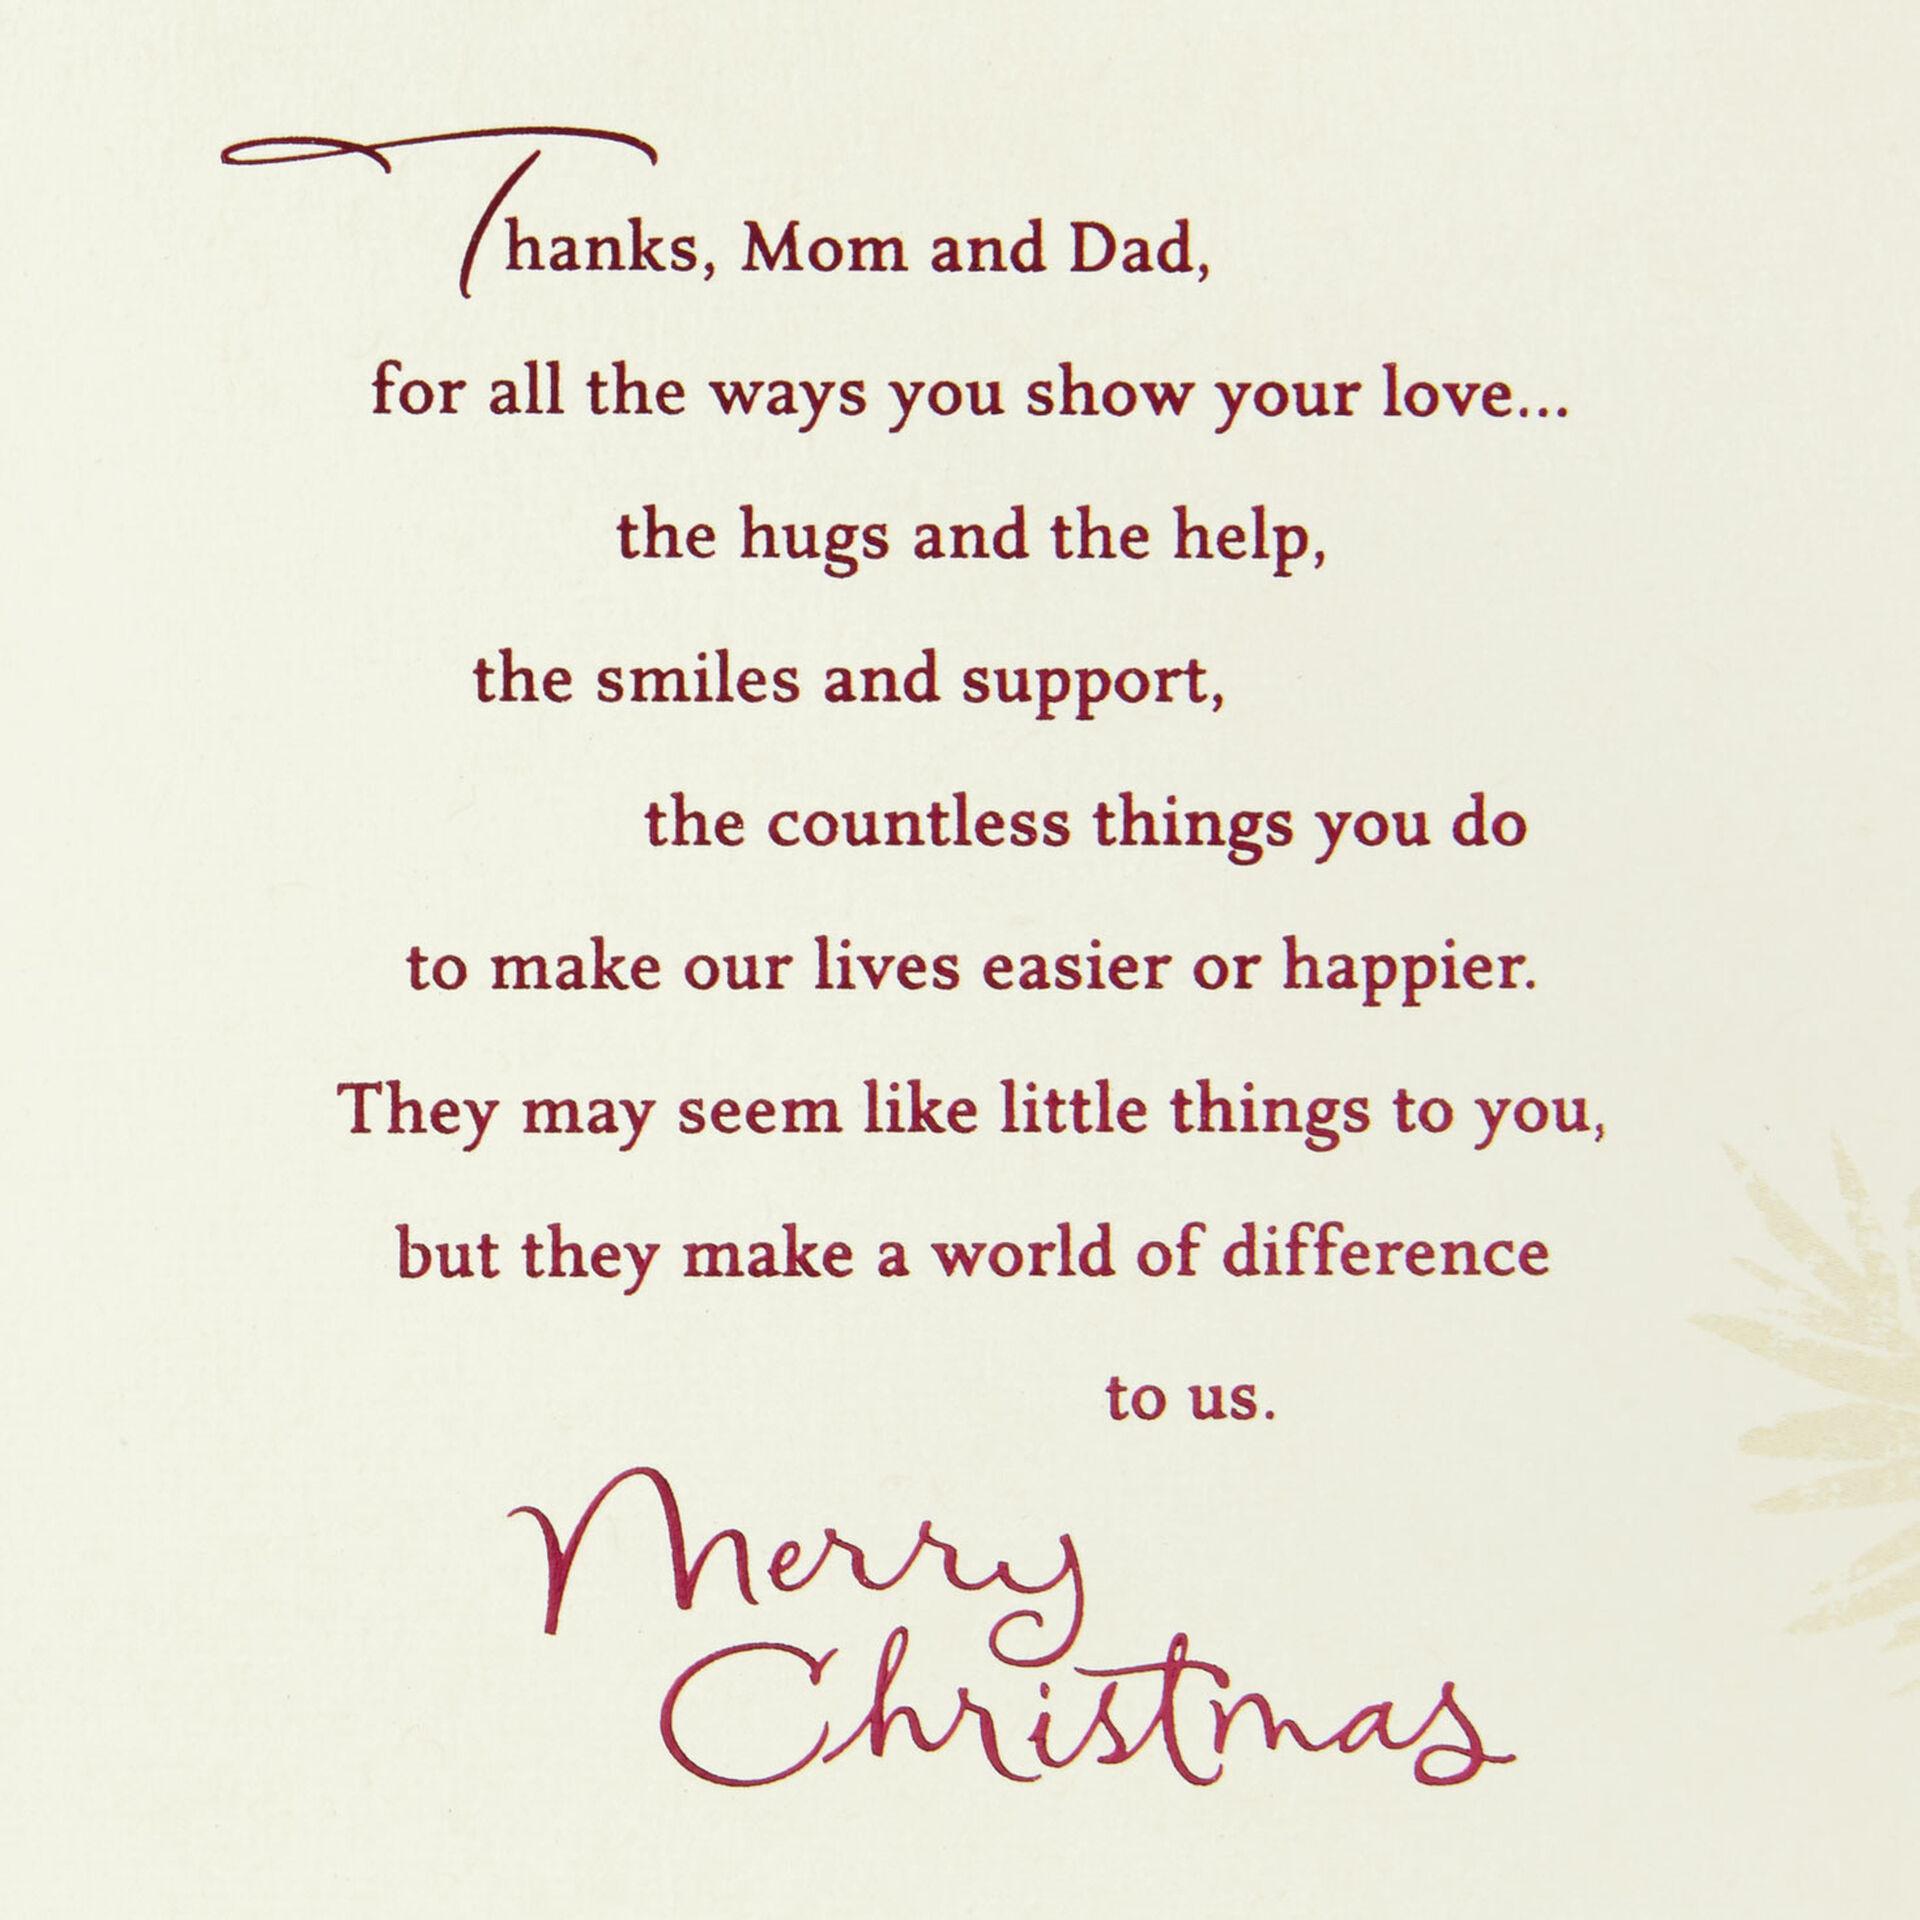 Mum and Dad Christmas Card 03